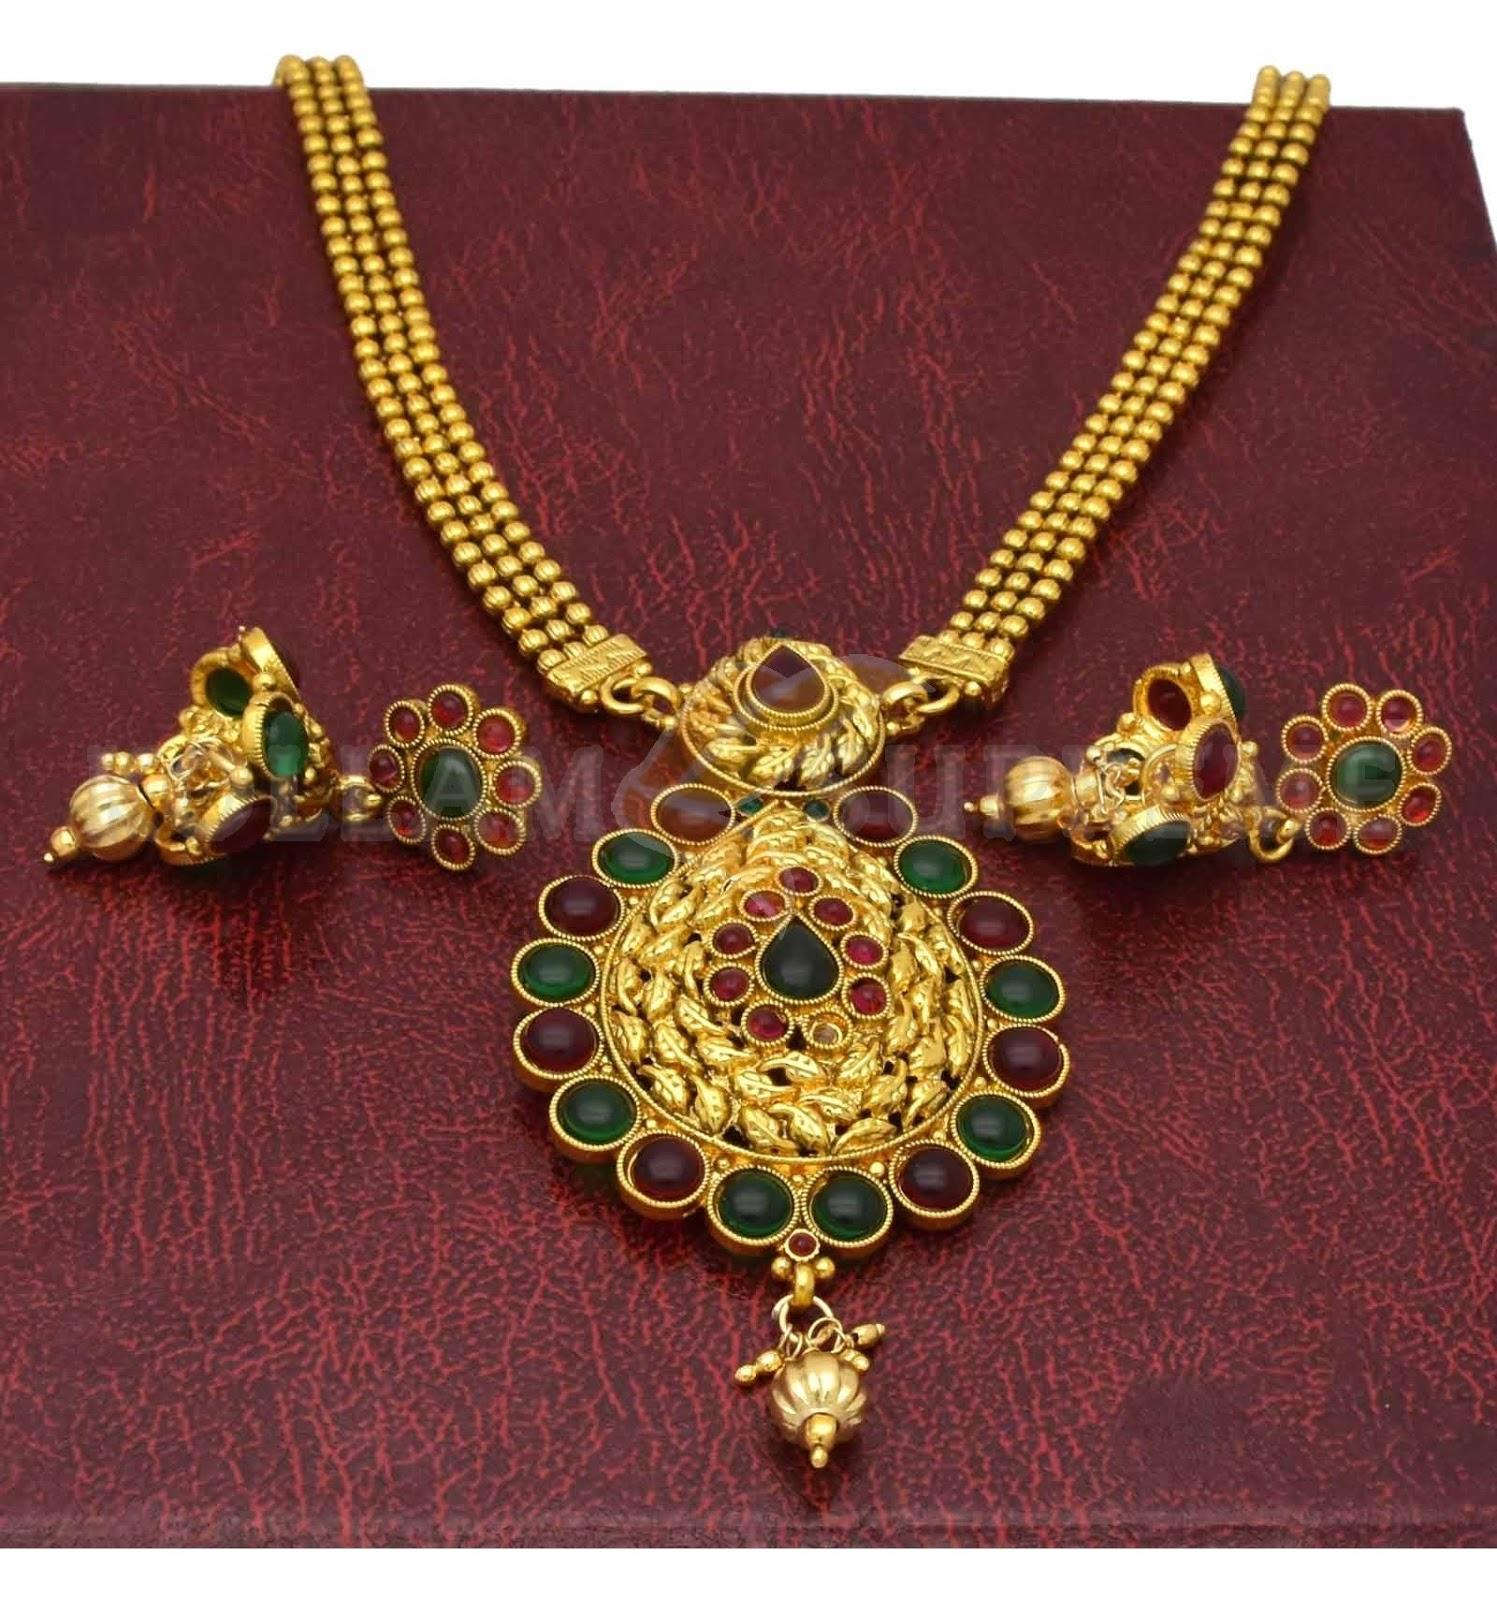 c5bc983e0dfb1 Kollam Supreme Premium Fashion Jewellery: Buy Antique Kemp Triple ...